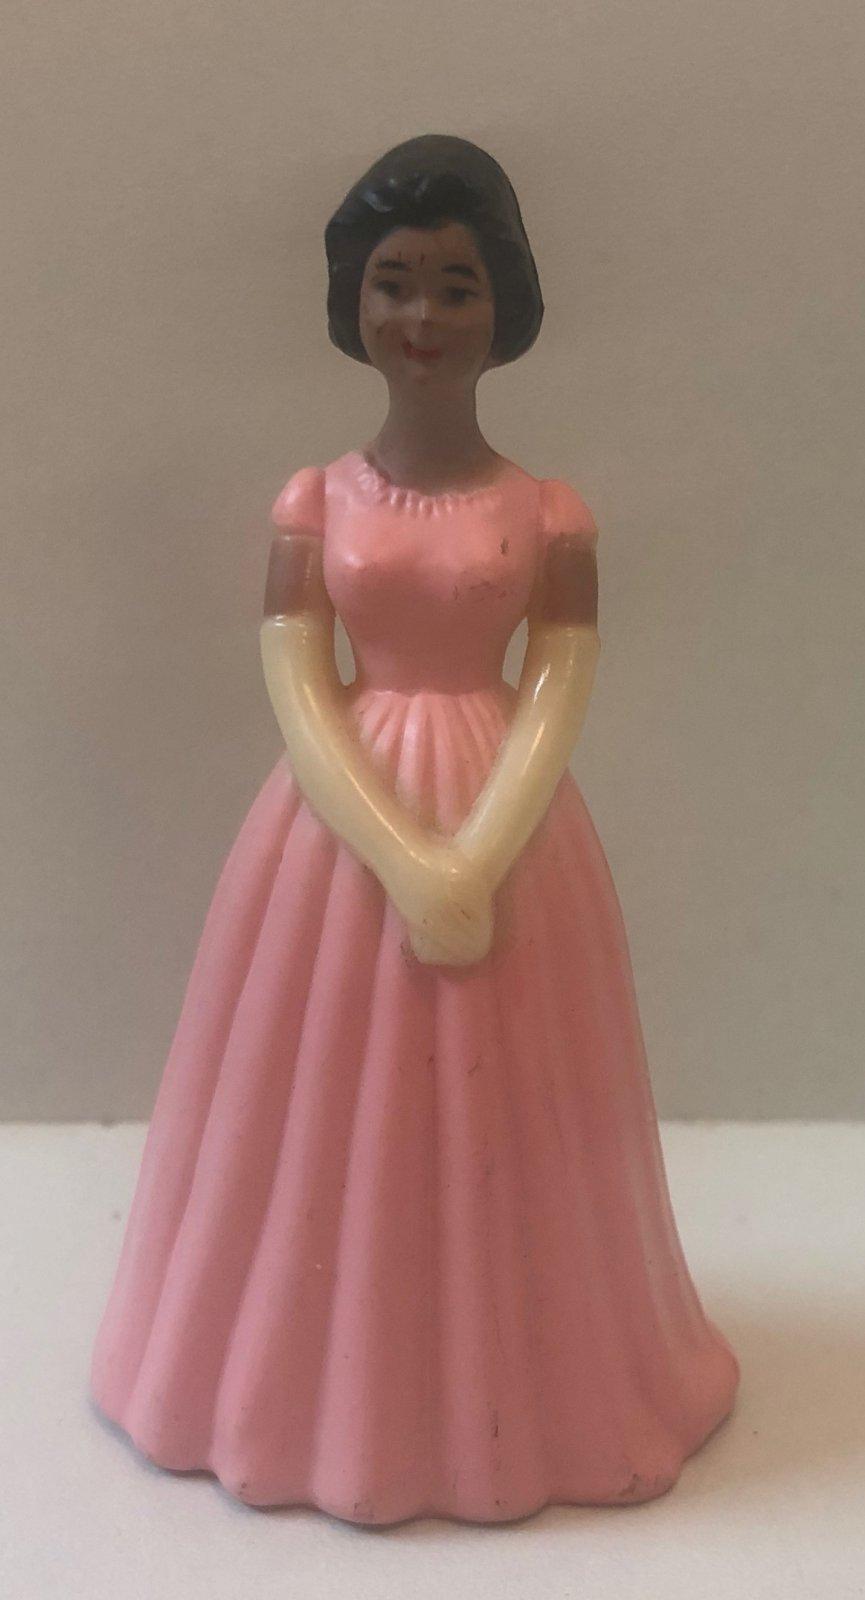 Pink Ethnic Bridesmaids 3 1/4 Tall